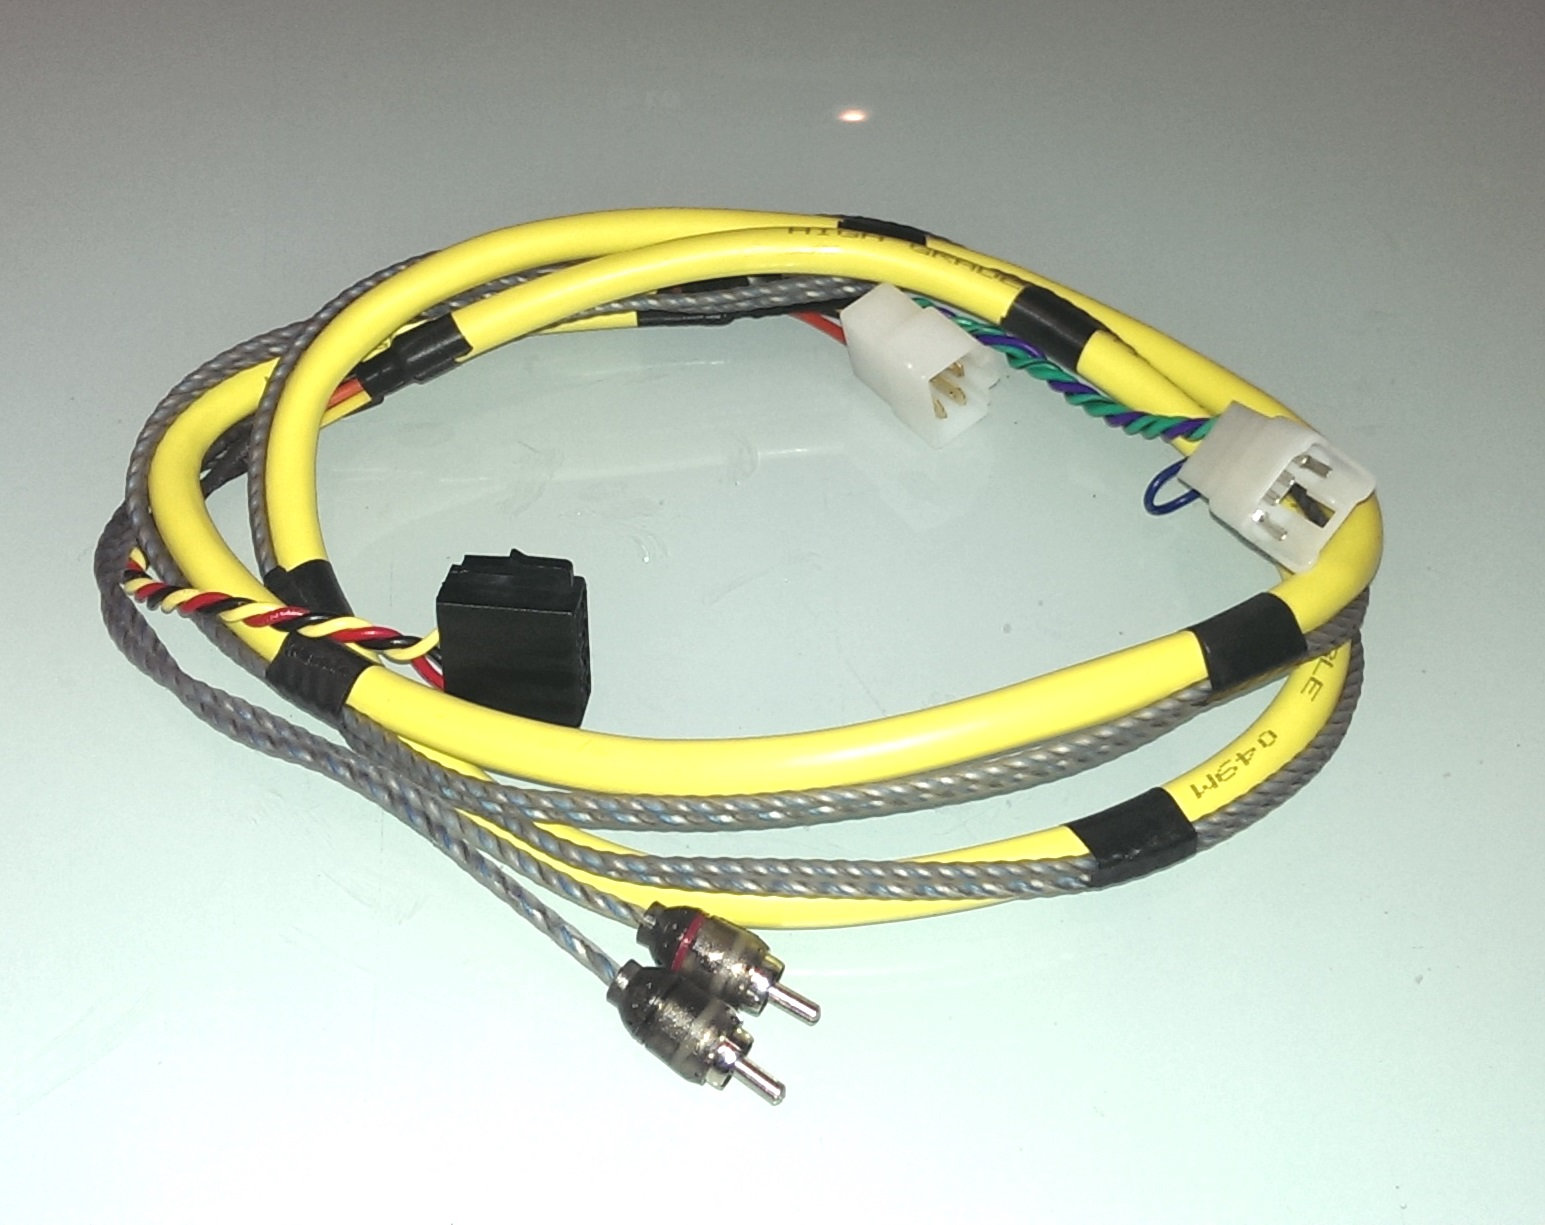 FORD/KENWOOD Bluetooth USB upgrade kit